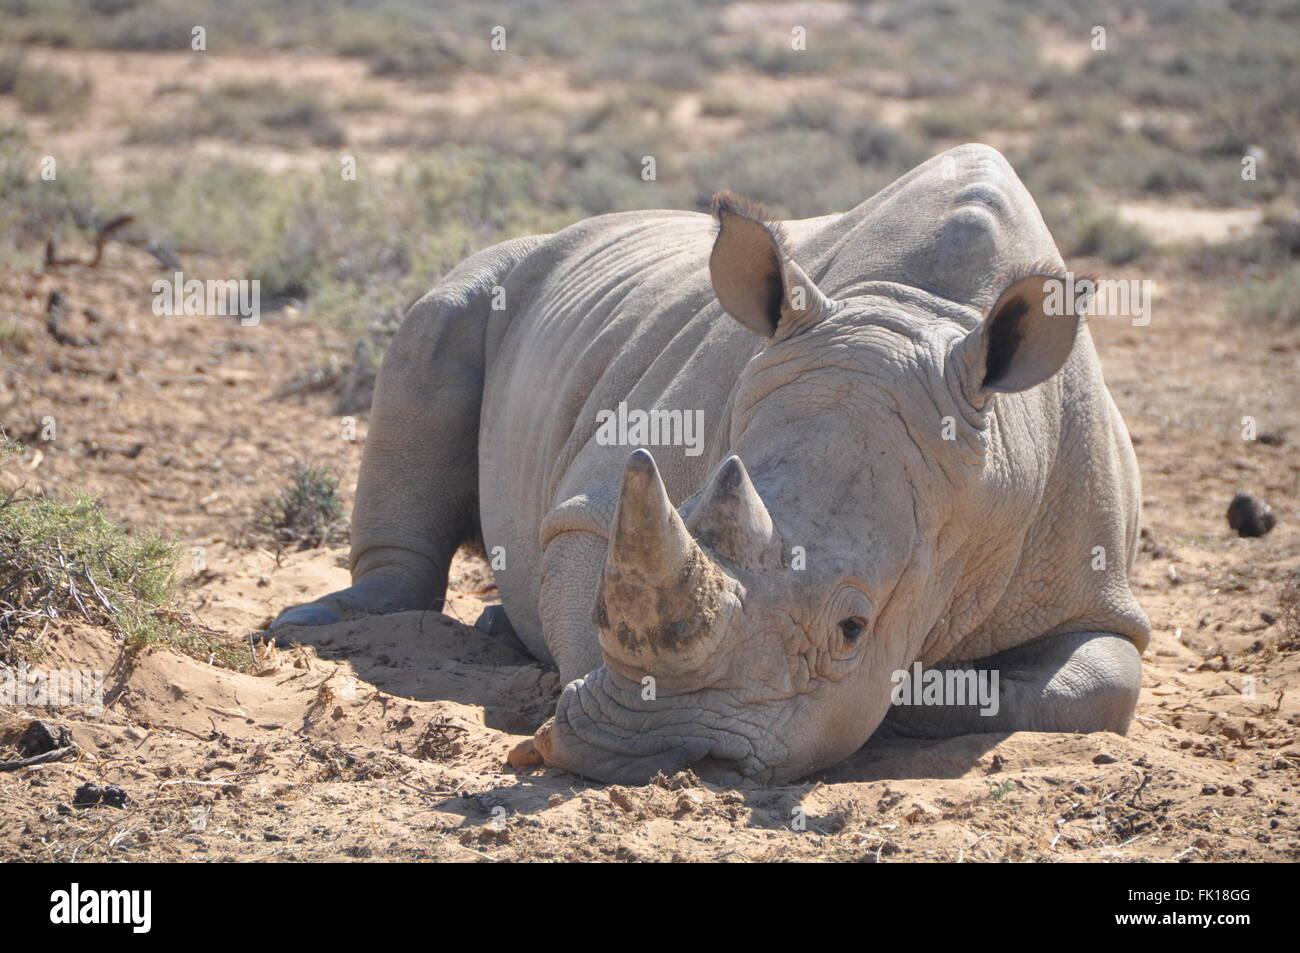 African Rhino relaxing in the Sun - Stock Image